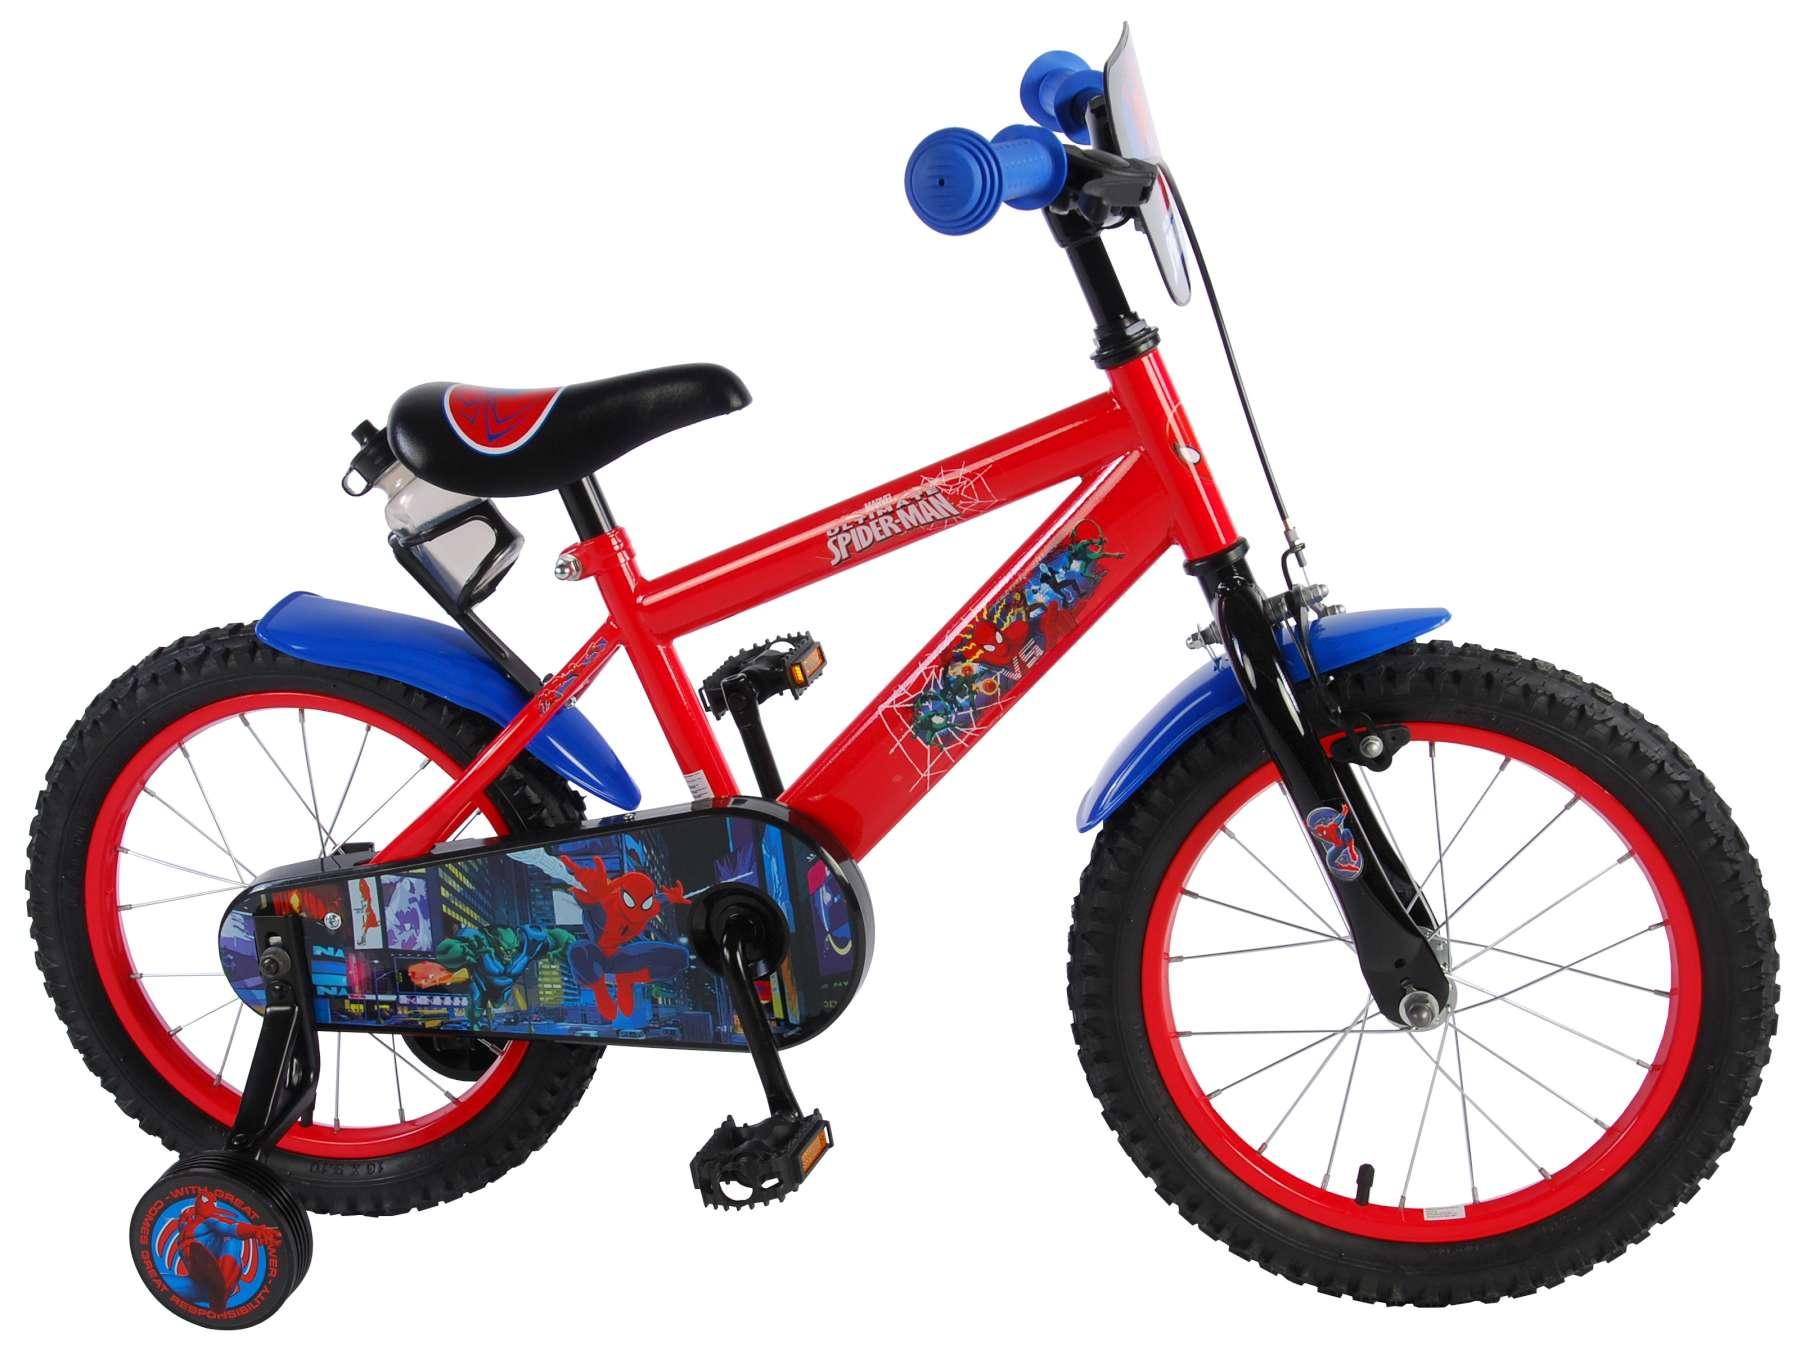 Volare - Detský bicykel pre chlapcov , Ultimate Spider-Man, 16